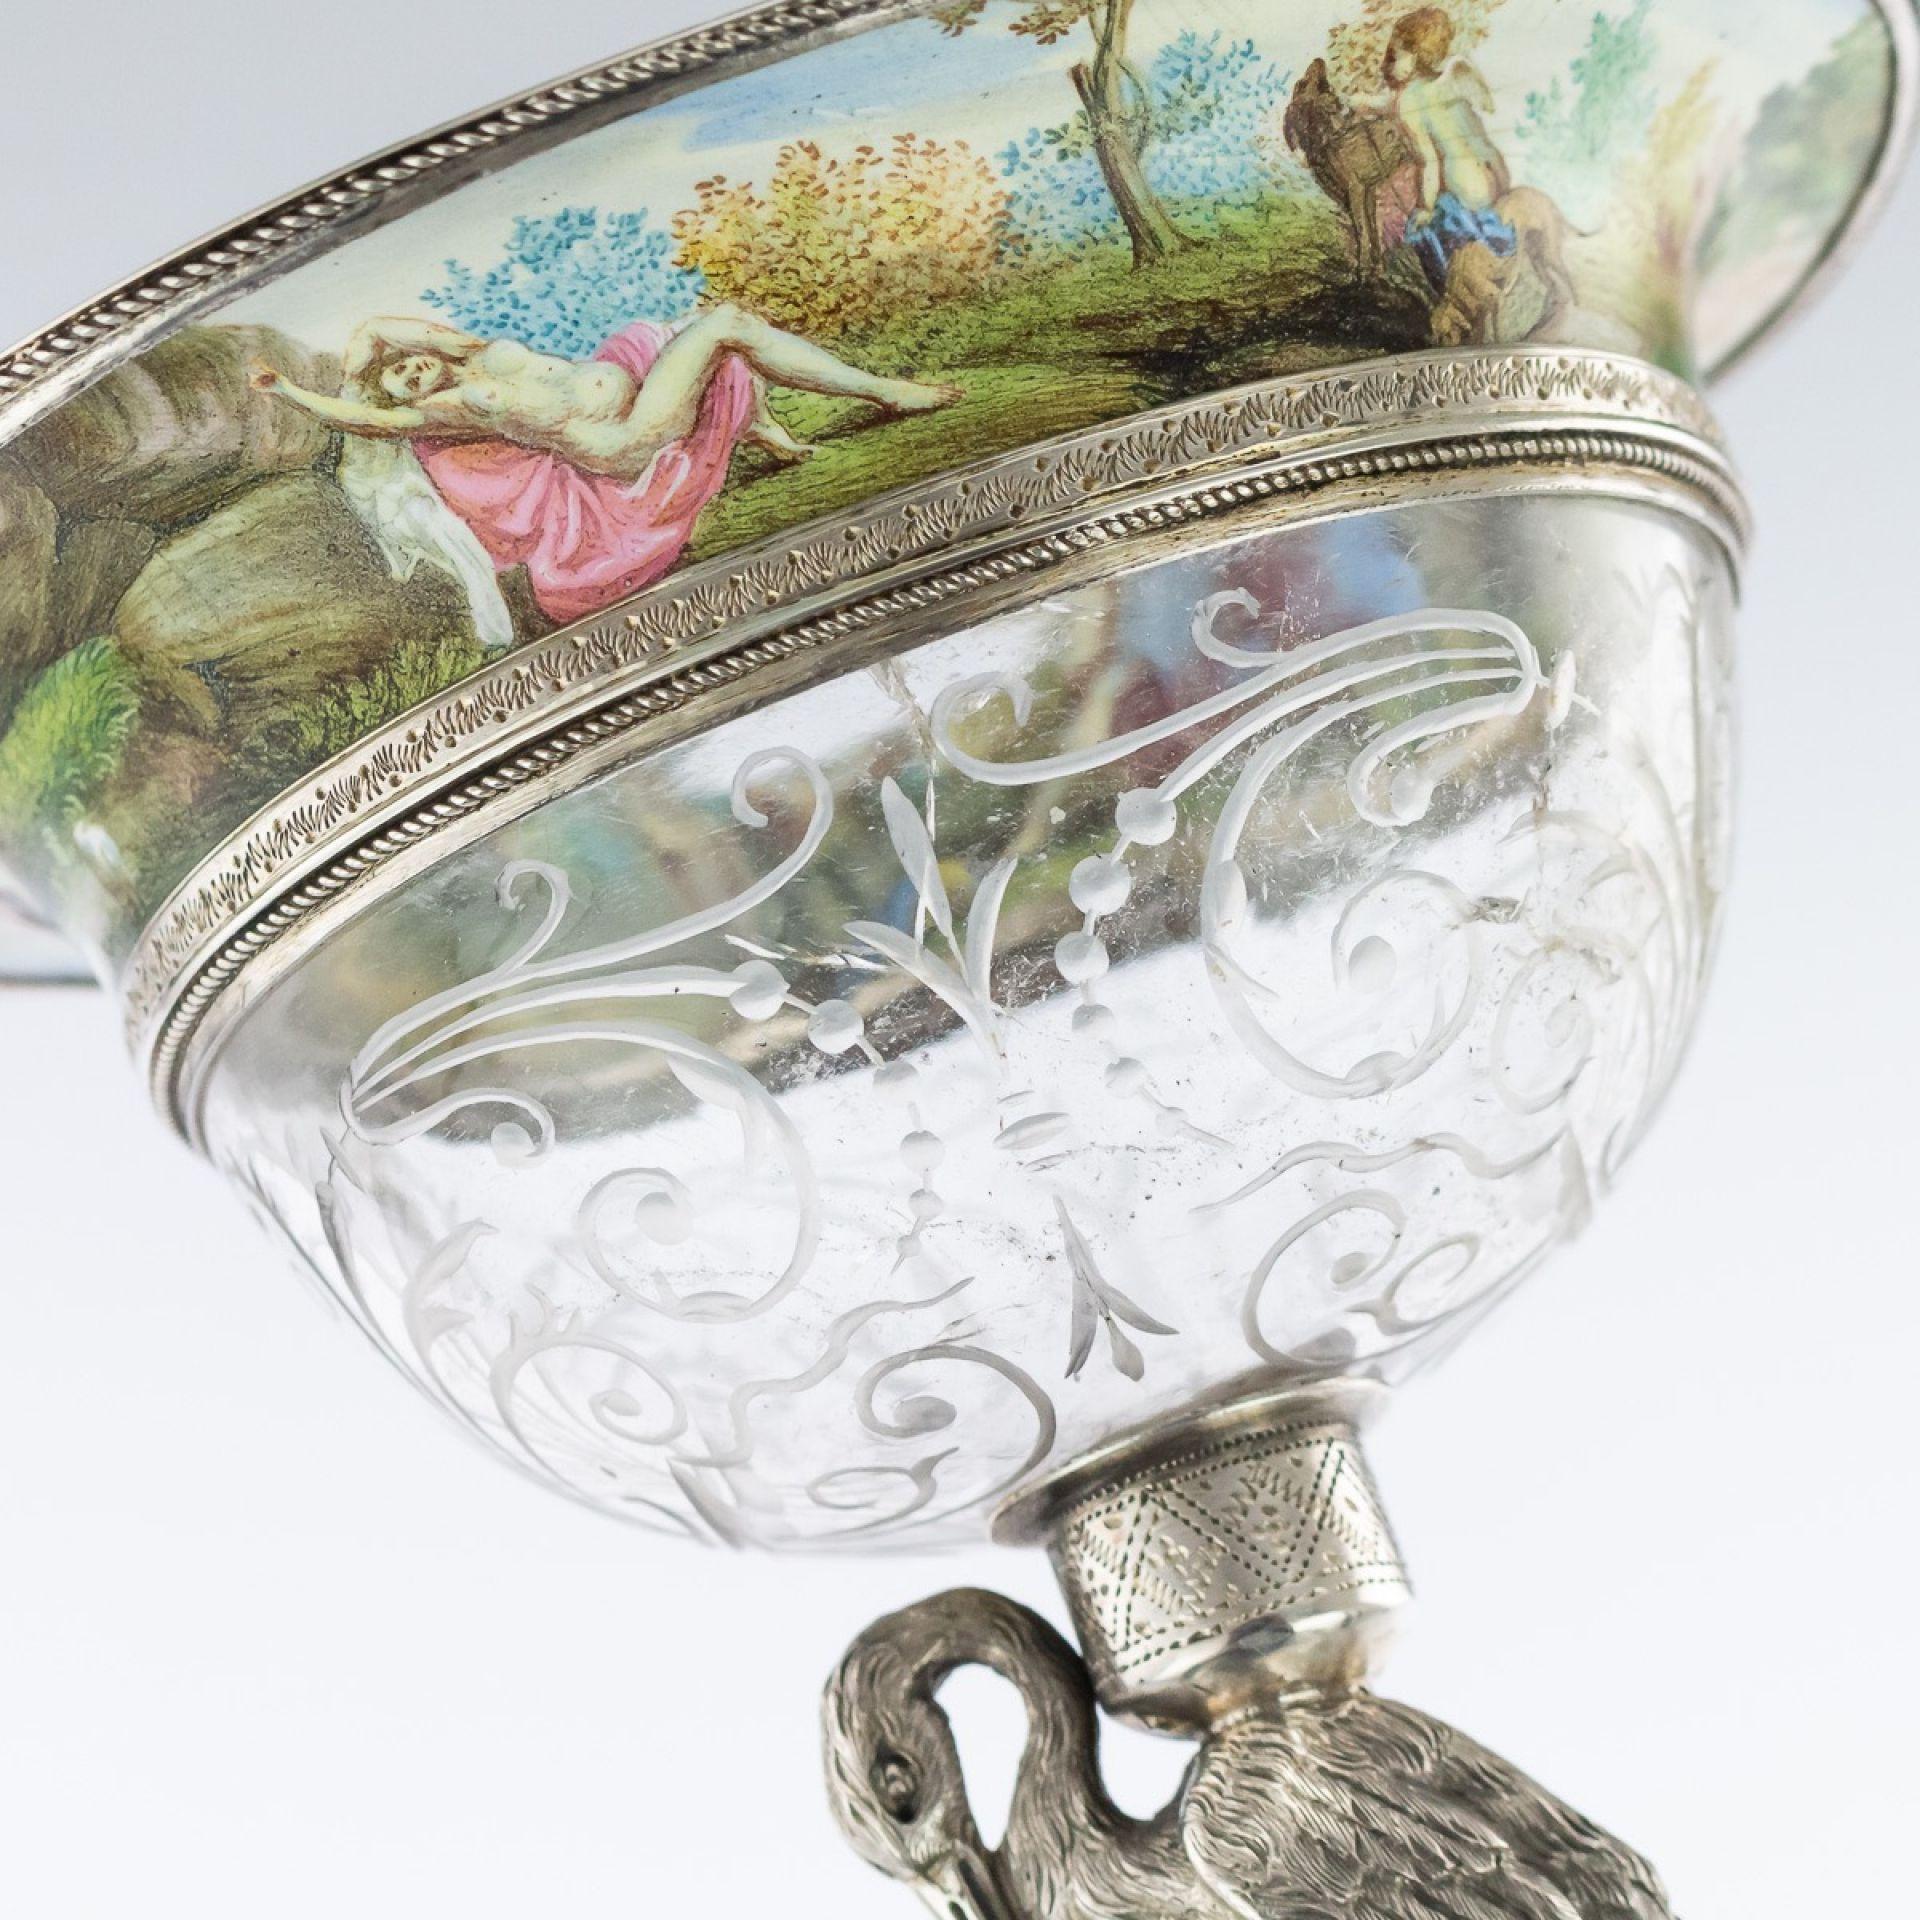 ANTIQUE 19thC AUSTRIAN ROCK CRYSTAL SILVER-GILT & ENAMEL BOWL ON STAND c.1880